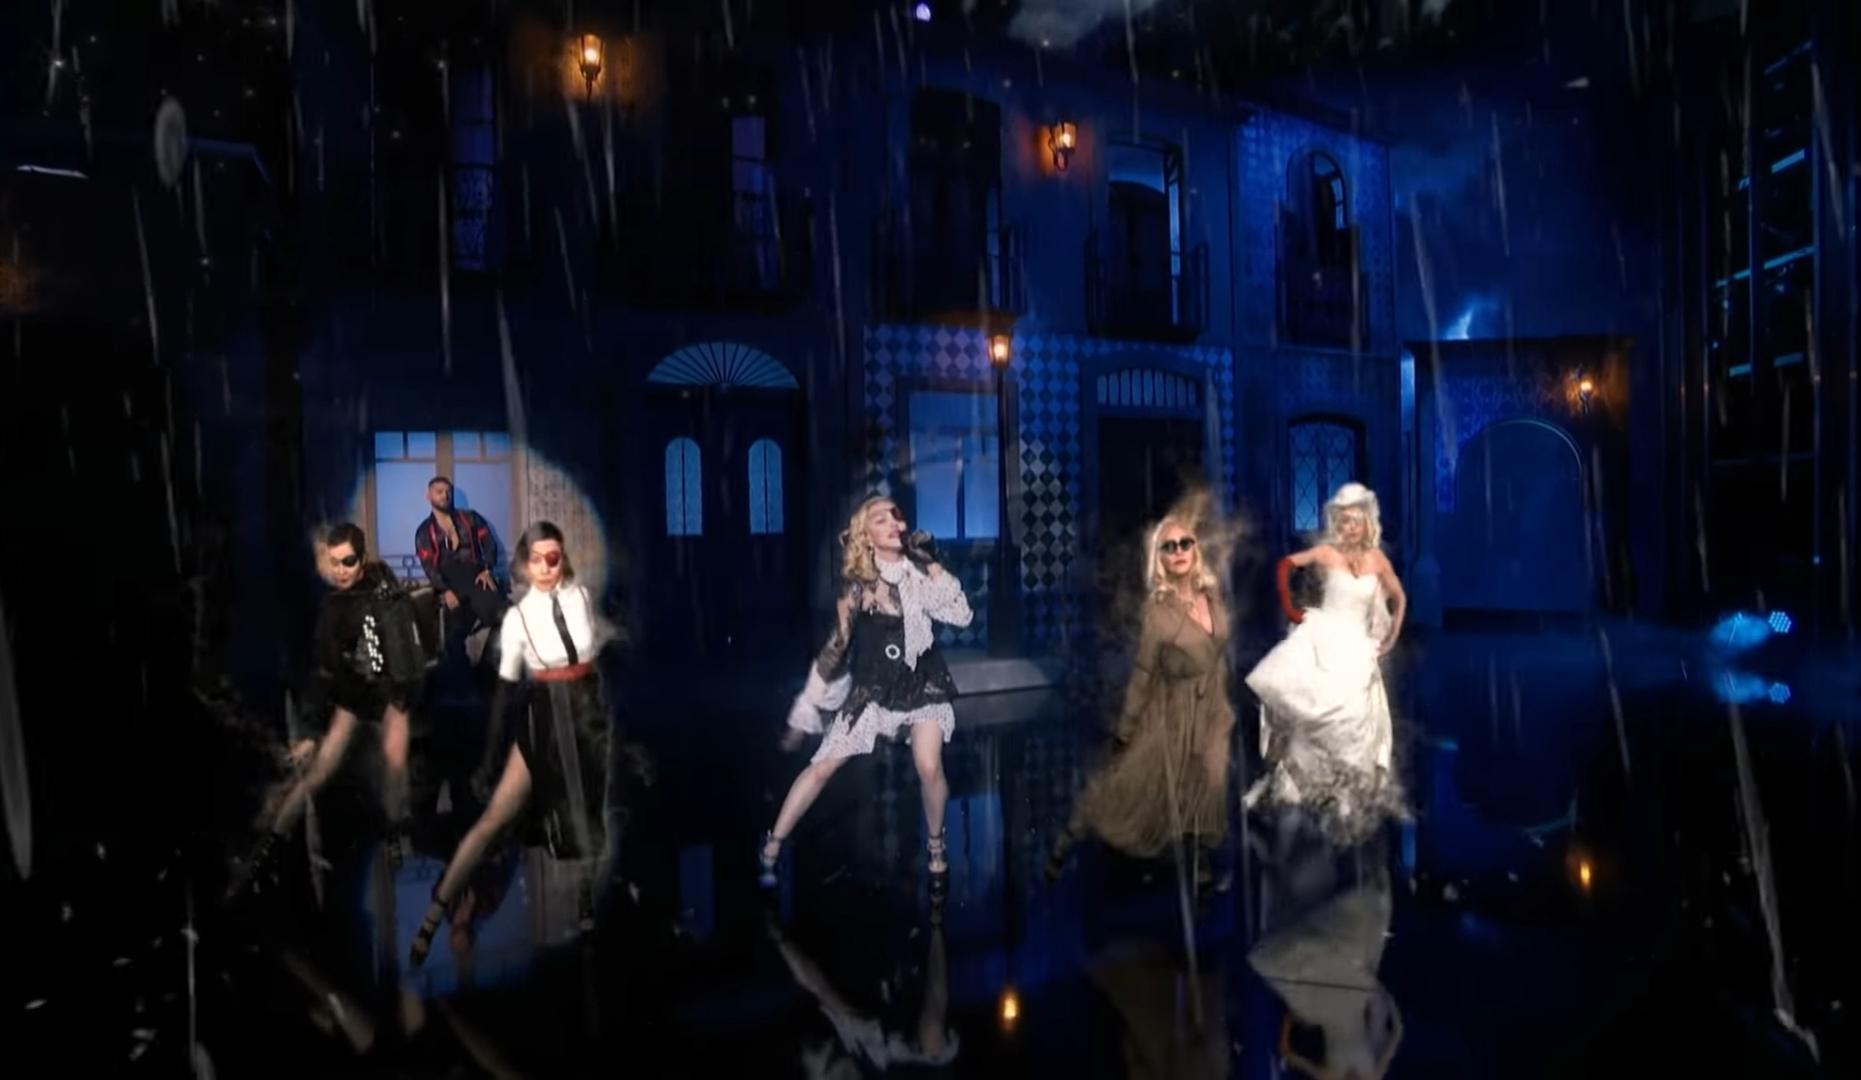 Courtesy of Vevo /Madonna performing  'Medellín' . also virtually choreographed.